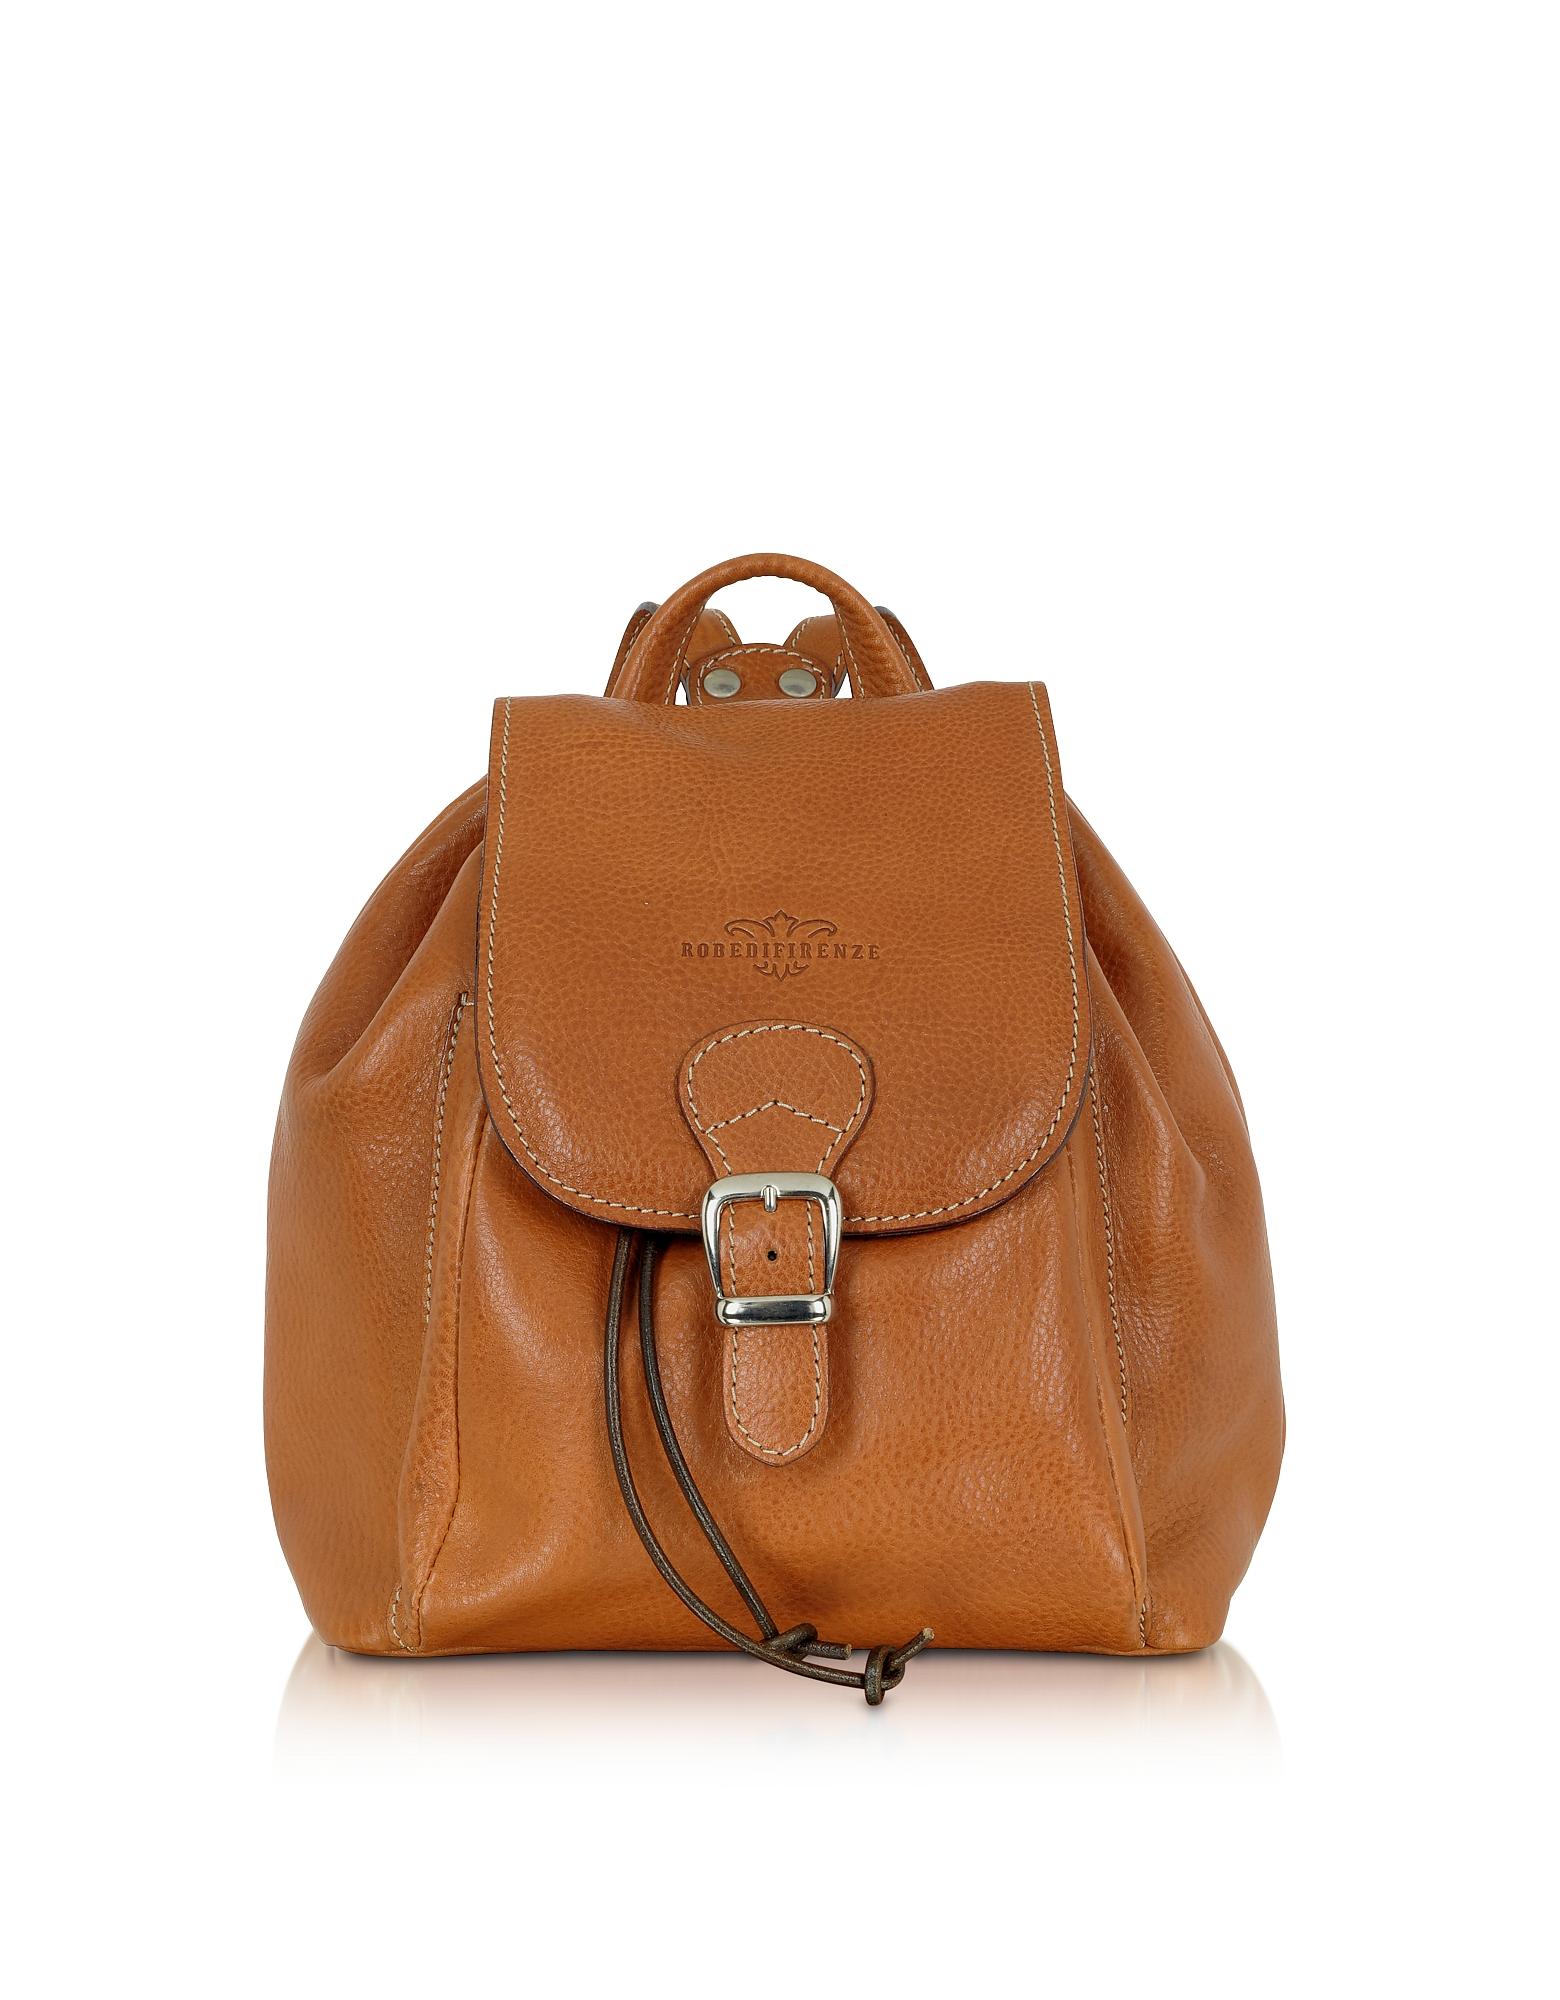 Robe di Firenze Handbags, Camel Italian Leather Backpack